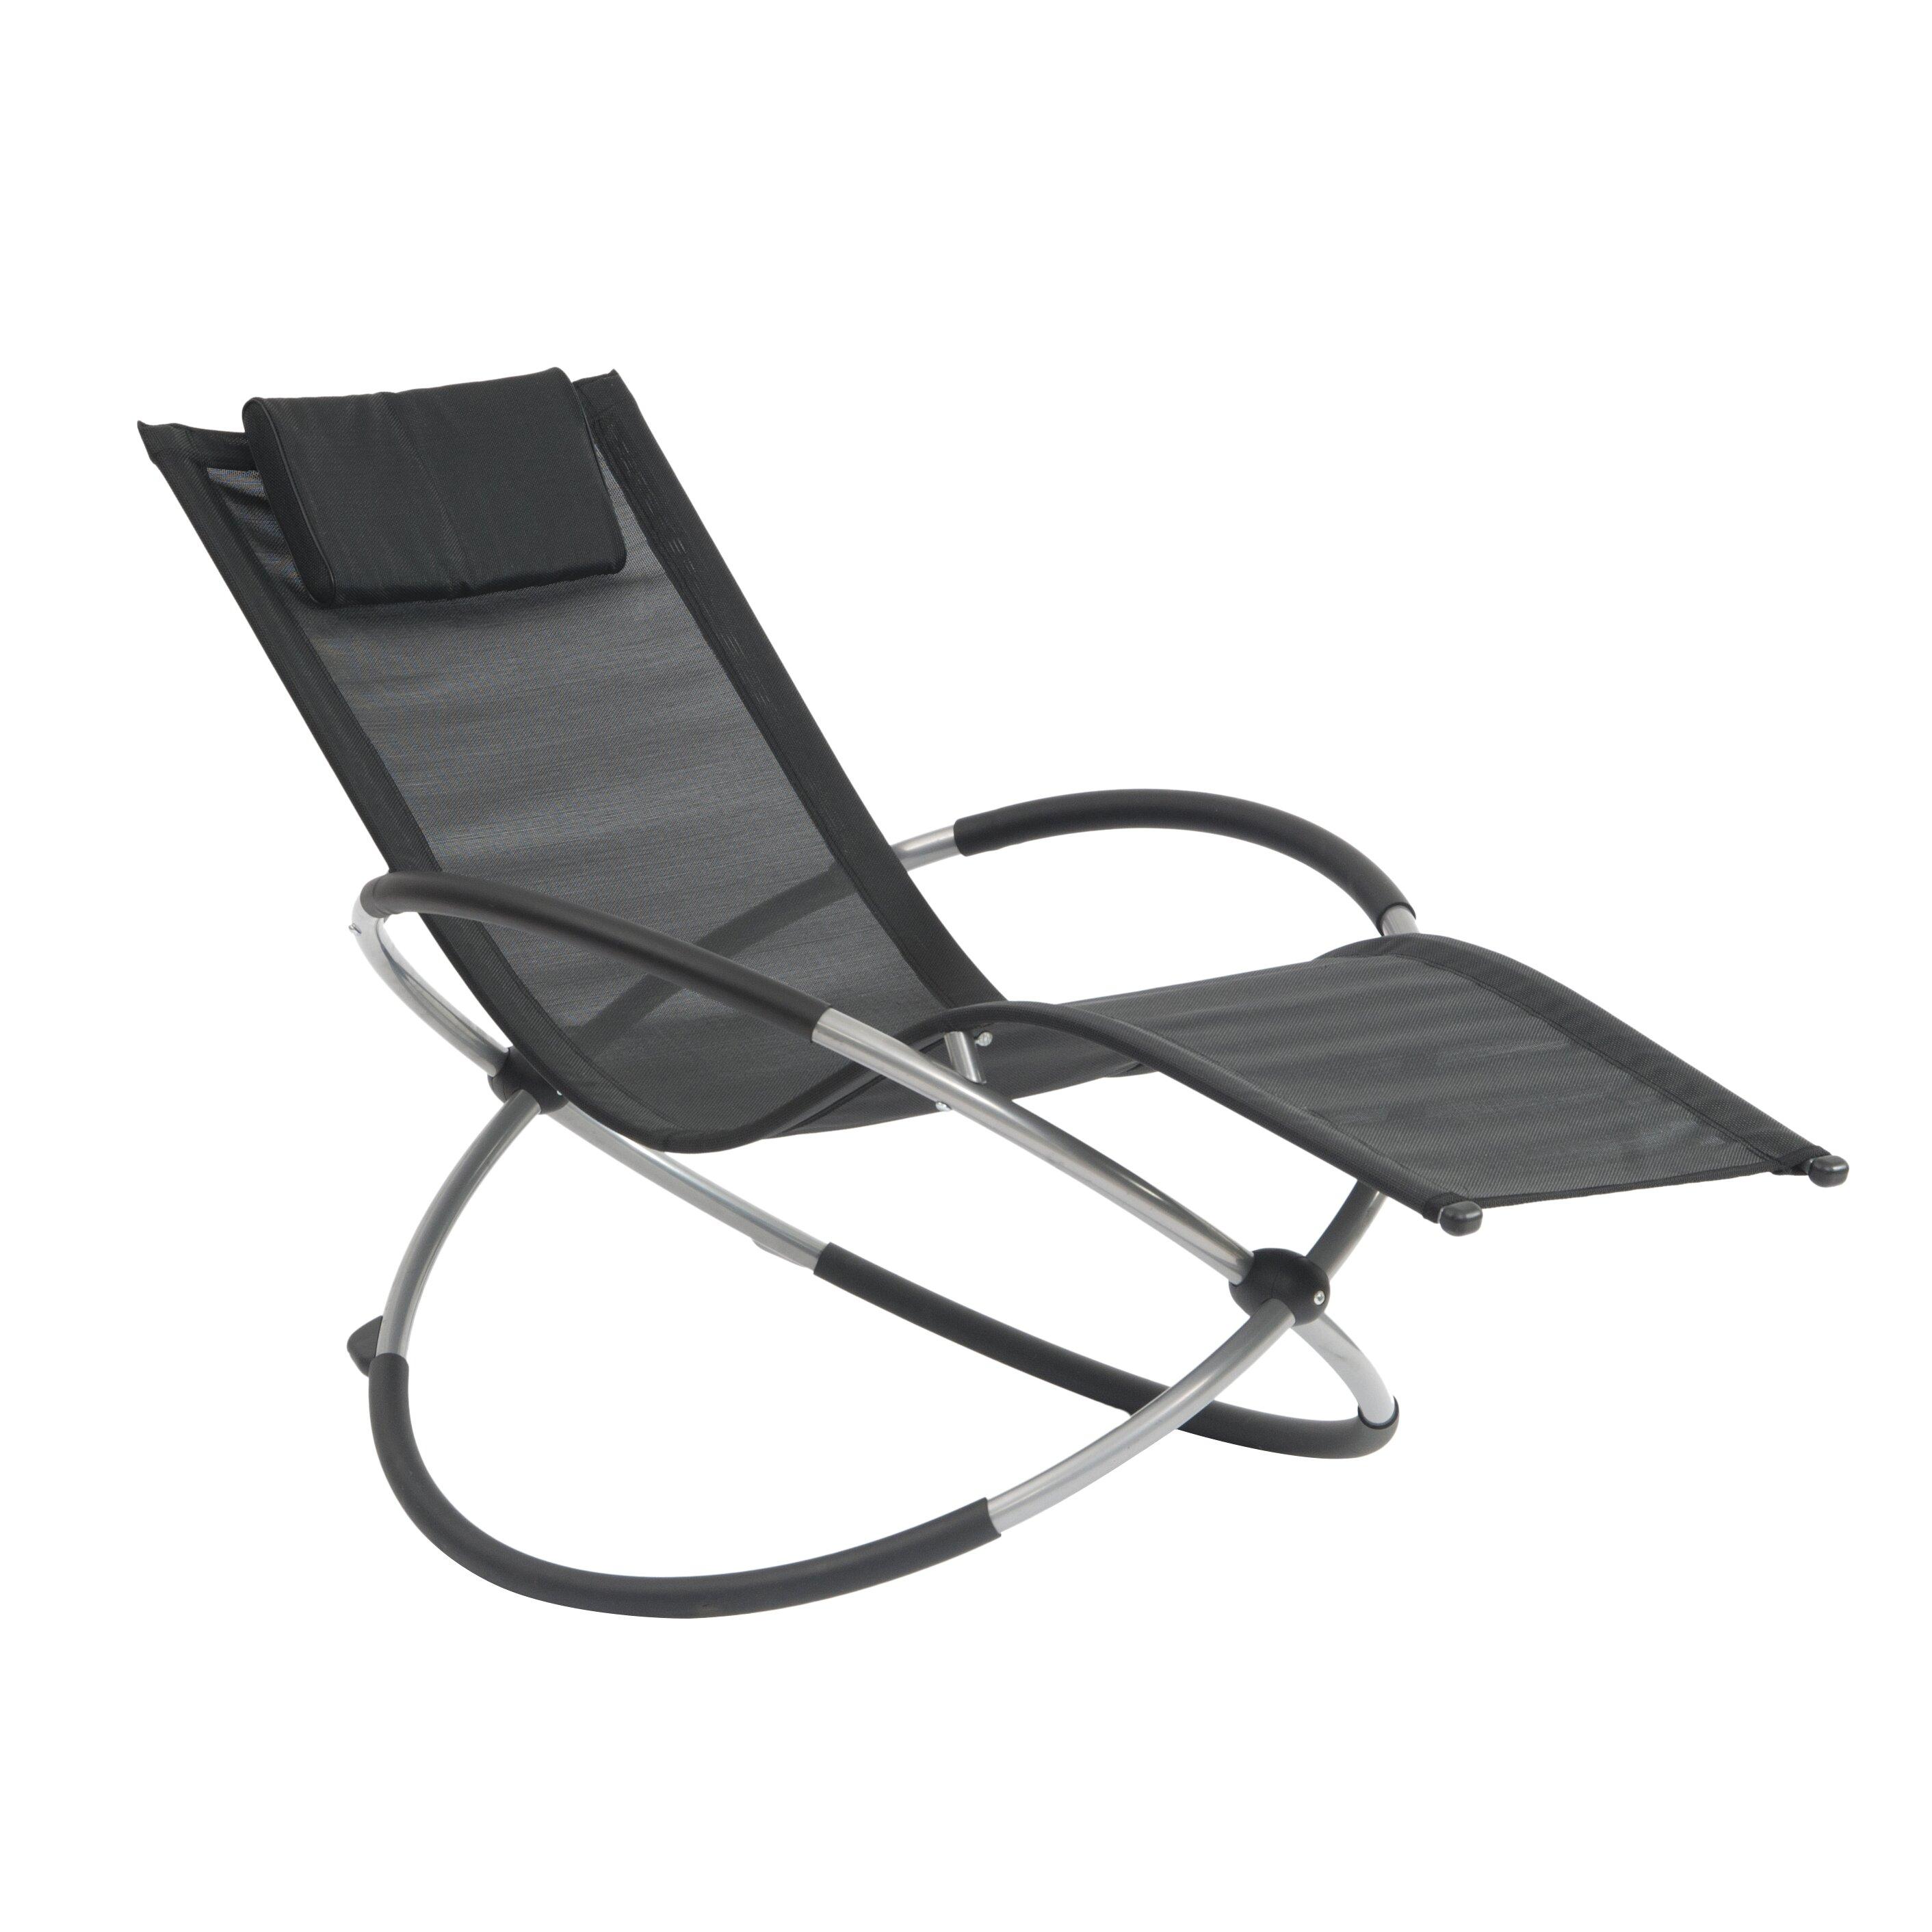 SunTime Outdoor Living Orbit Relaxer Chaise Lounge ... on Suntime Outdoor Living id=13032